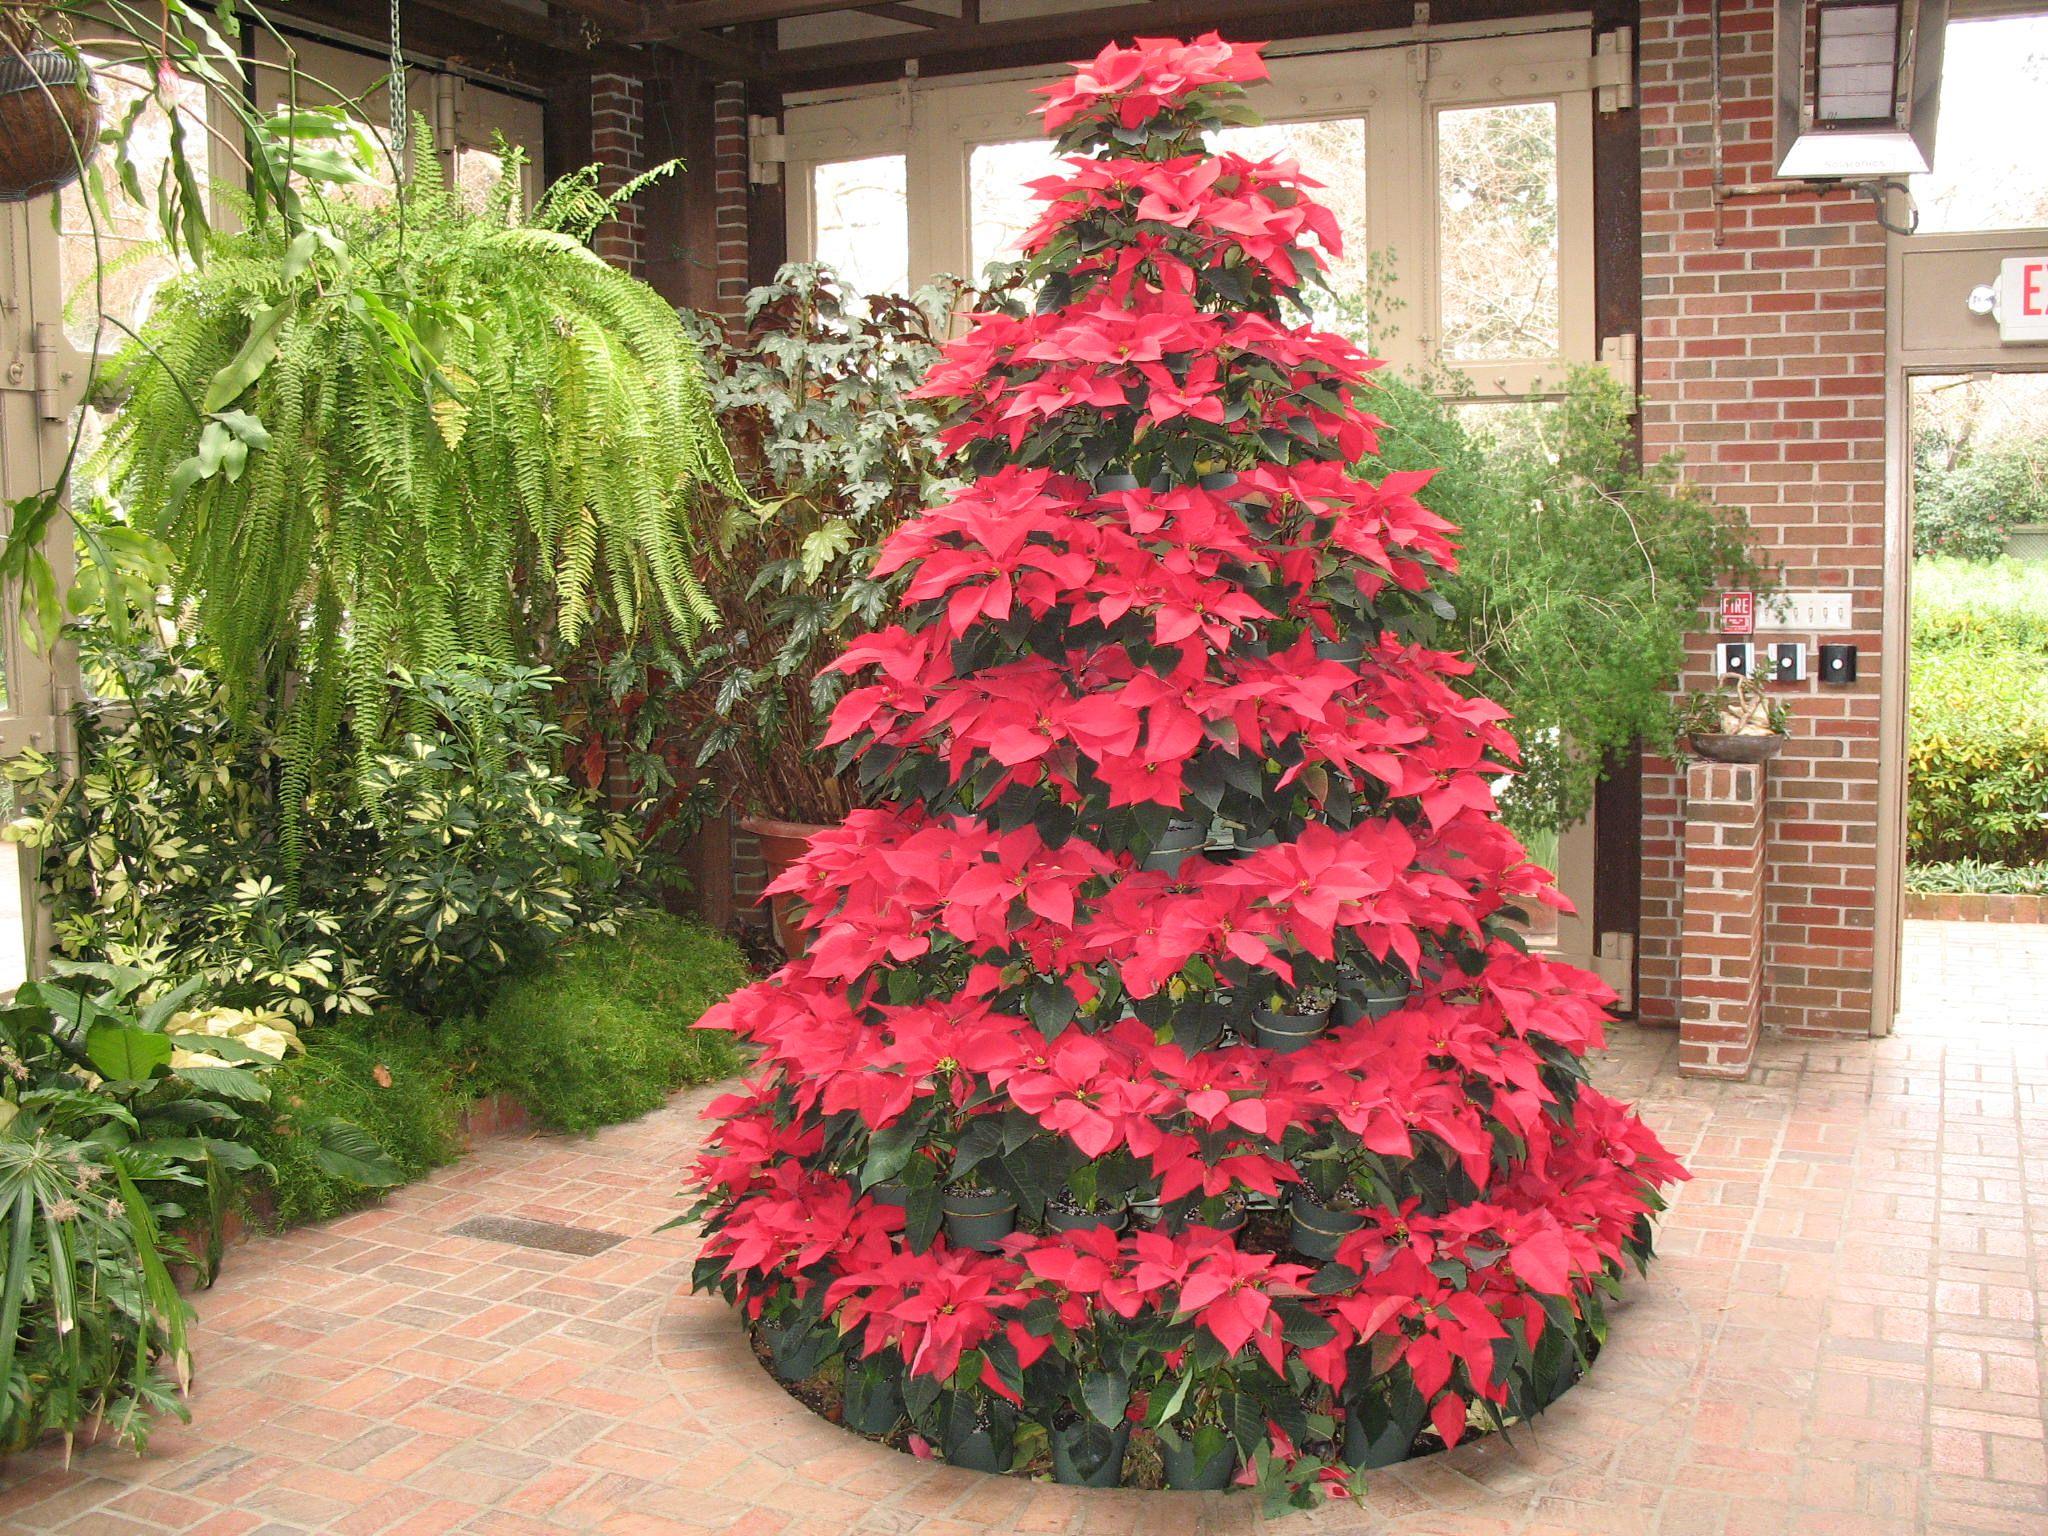 Euphorbia Pulcherrima Euphorbia Pulcherrima Onlineplantguide Com 3414 Christmas Plants Poinsettia Tree Christmas Tree Skirt